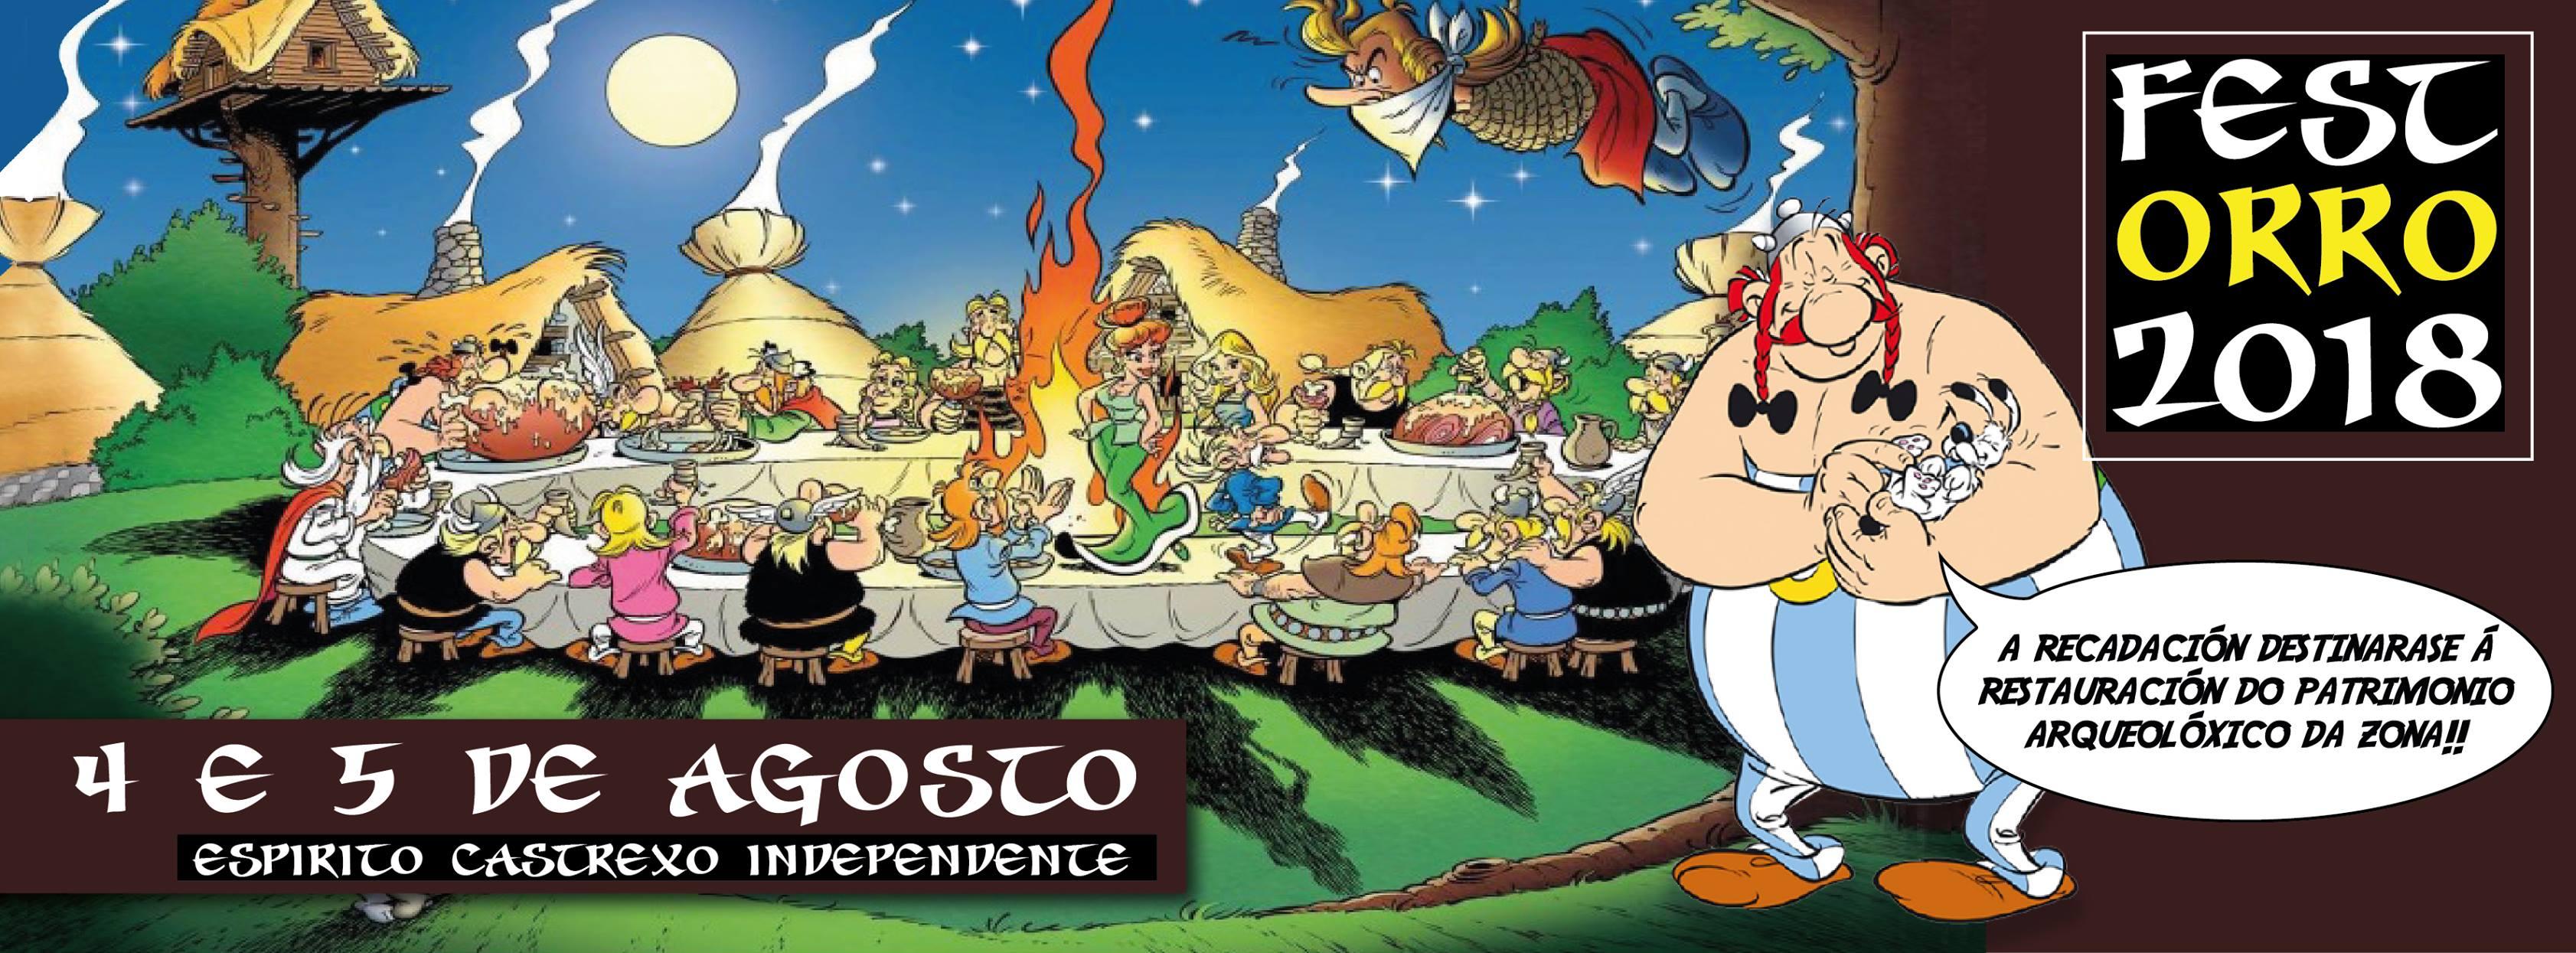 Balboa celebra este fin de semana las fiestas de San Salvador con un 'Festorro' 1